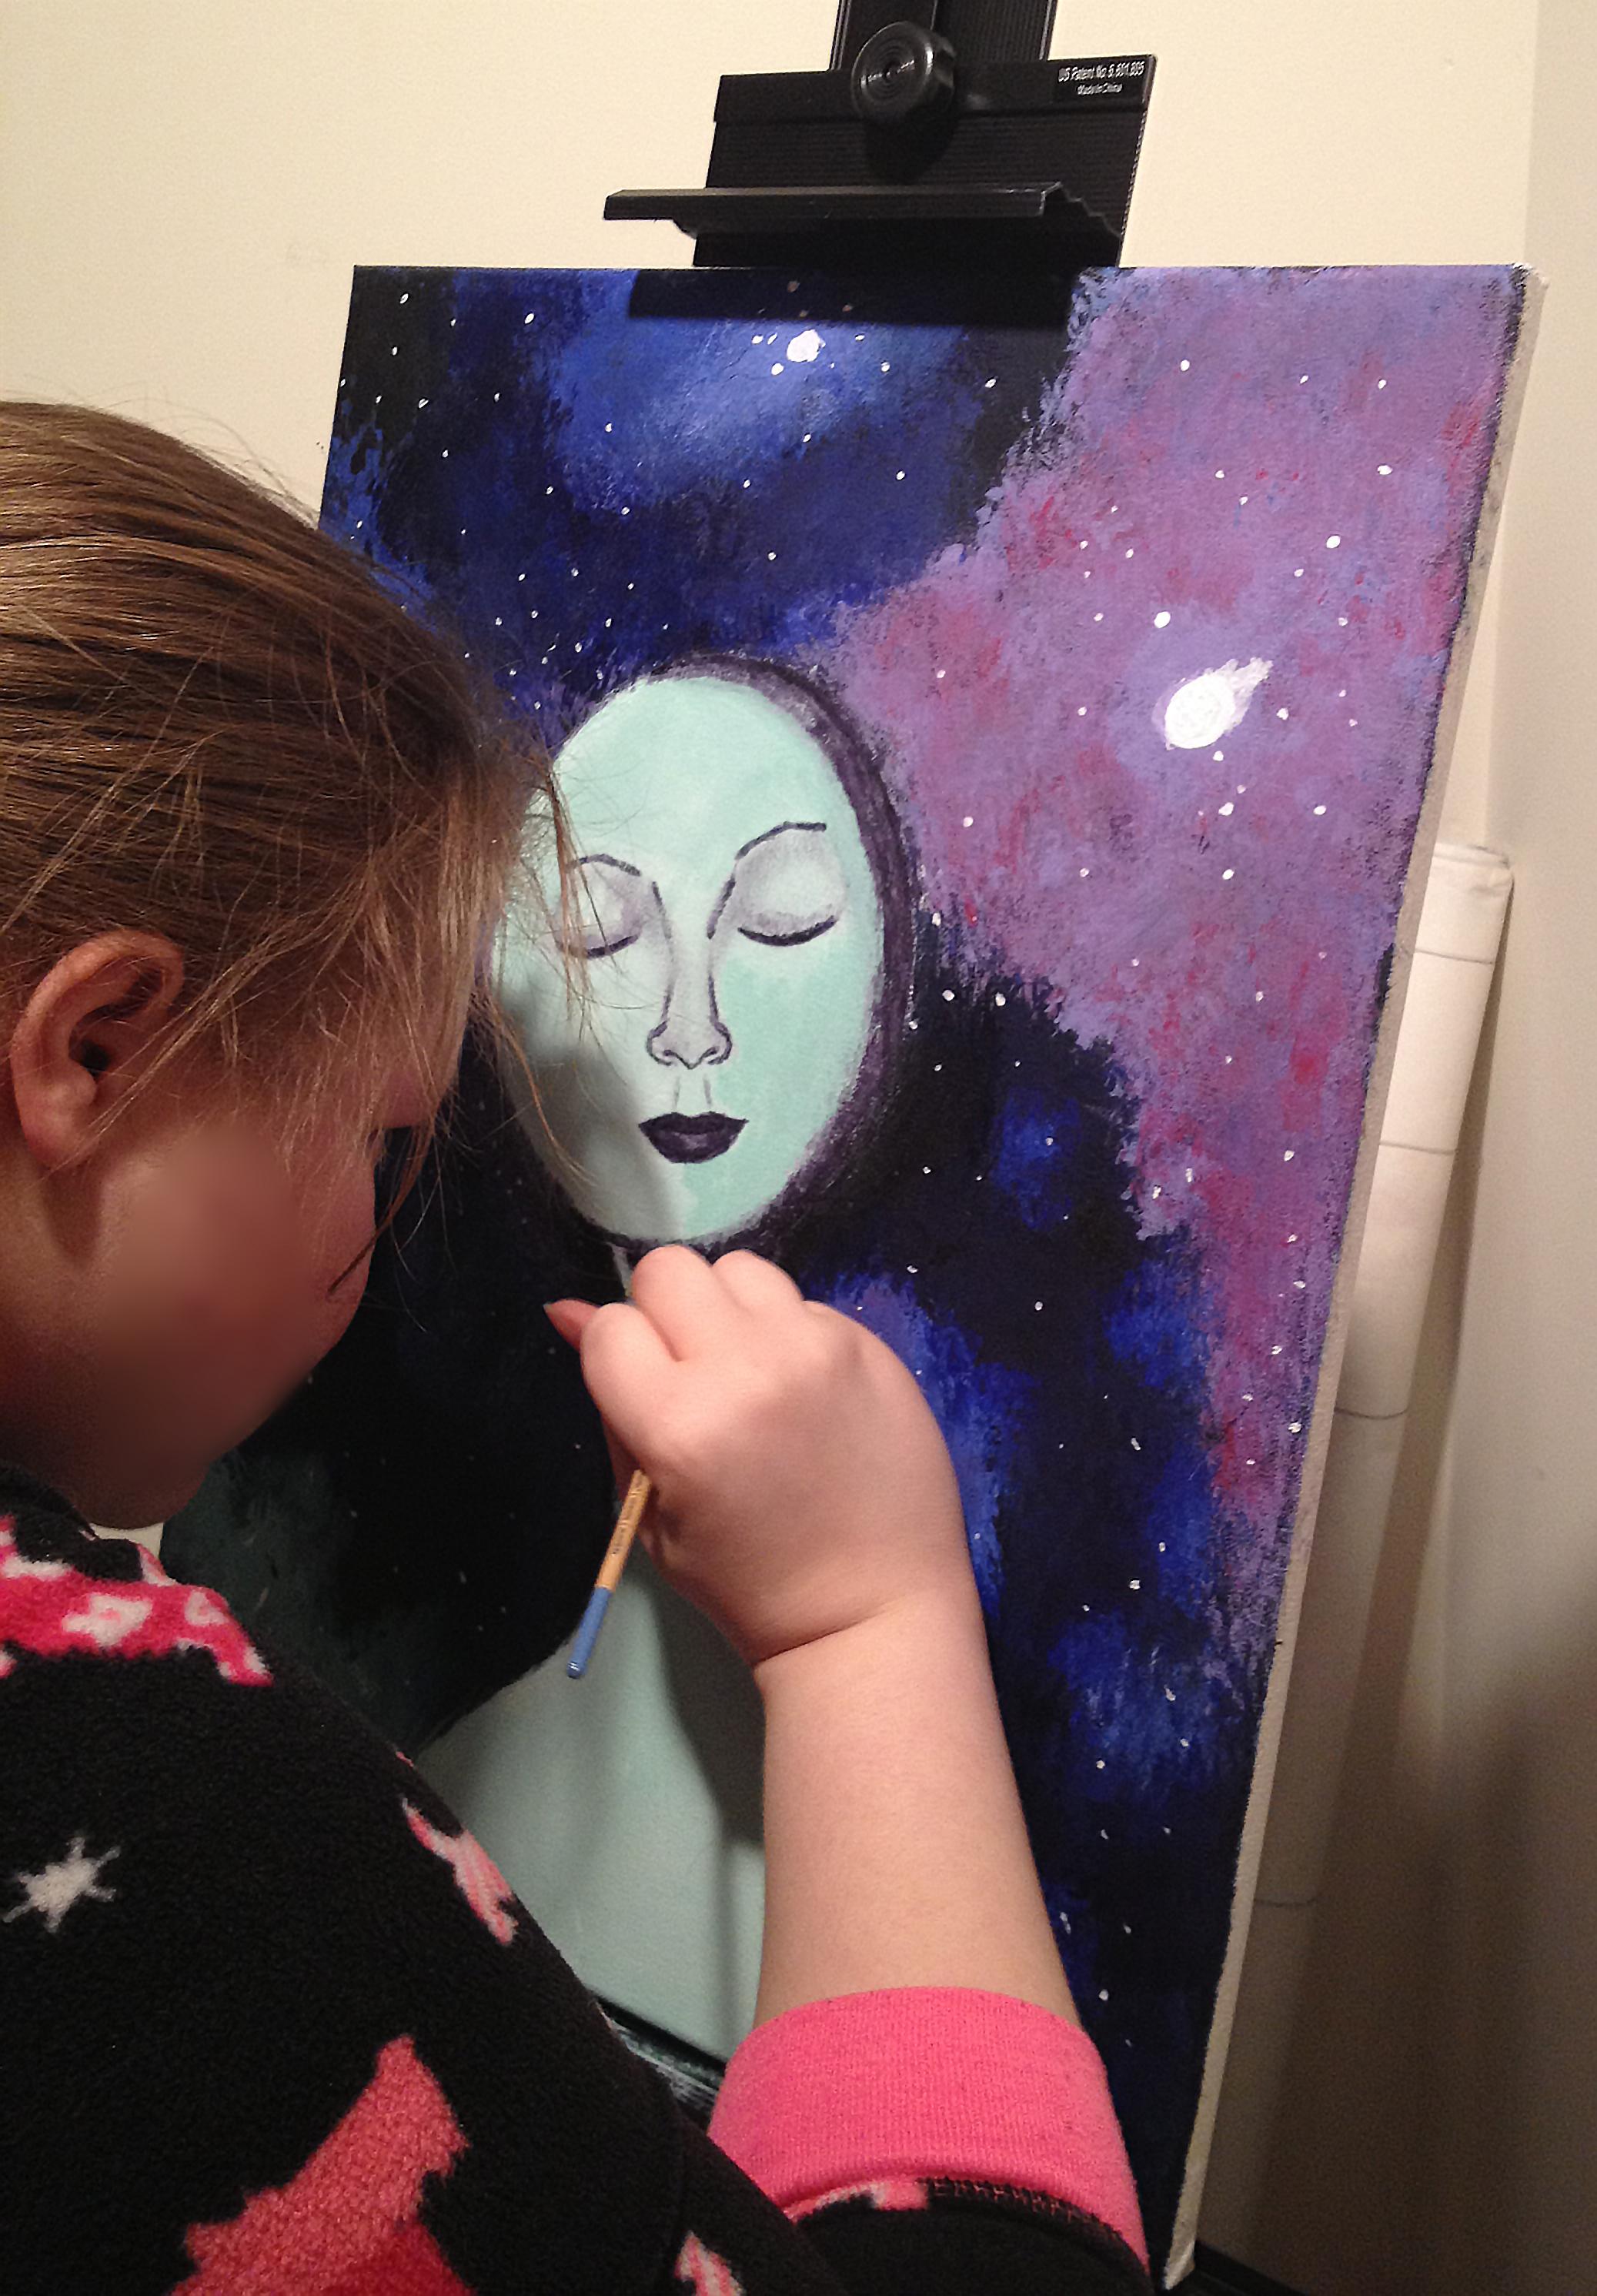 Lauren working on one of her paintings.